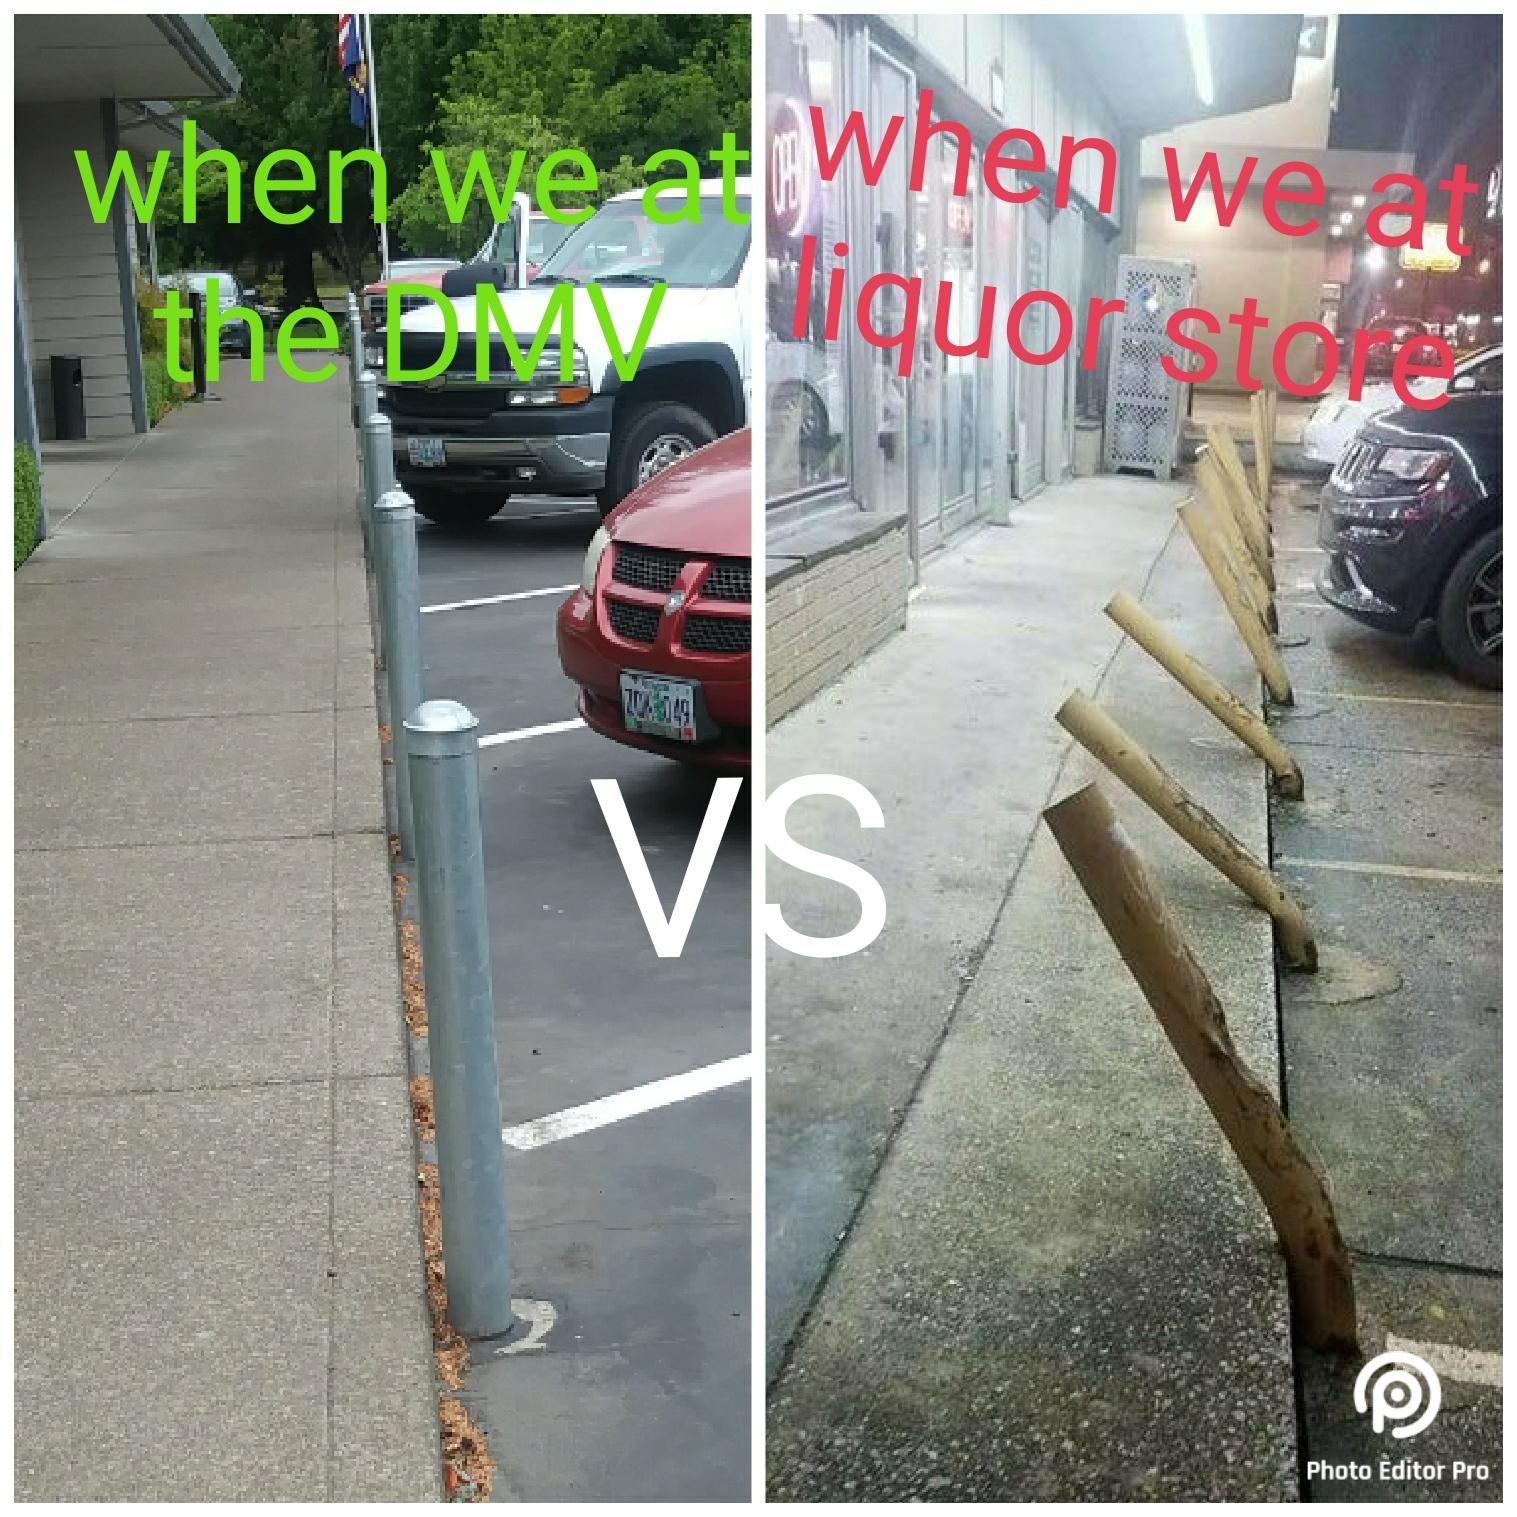 Was thinking at my local dmv